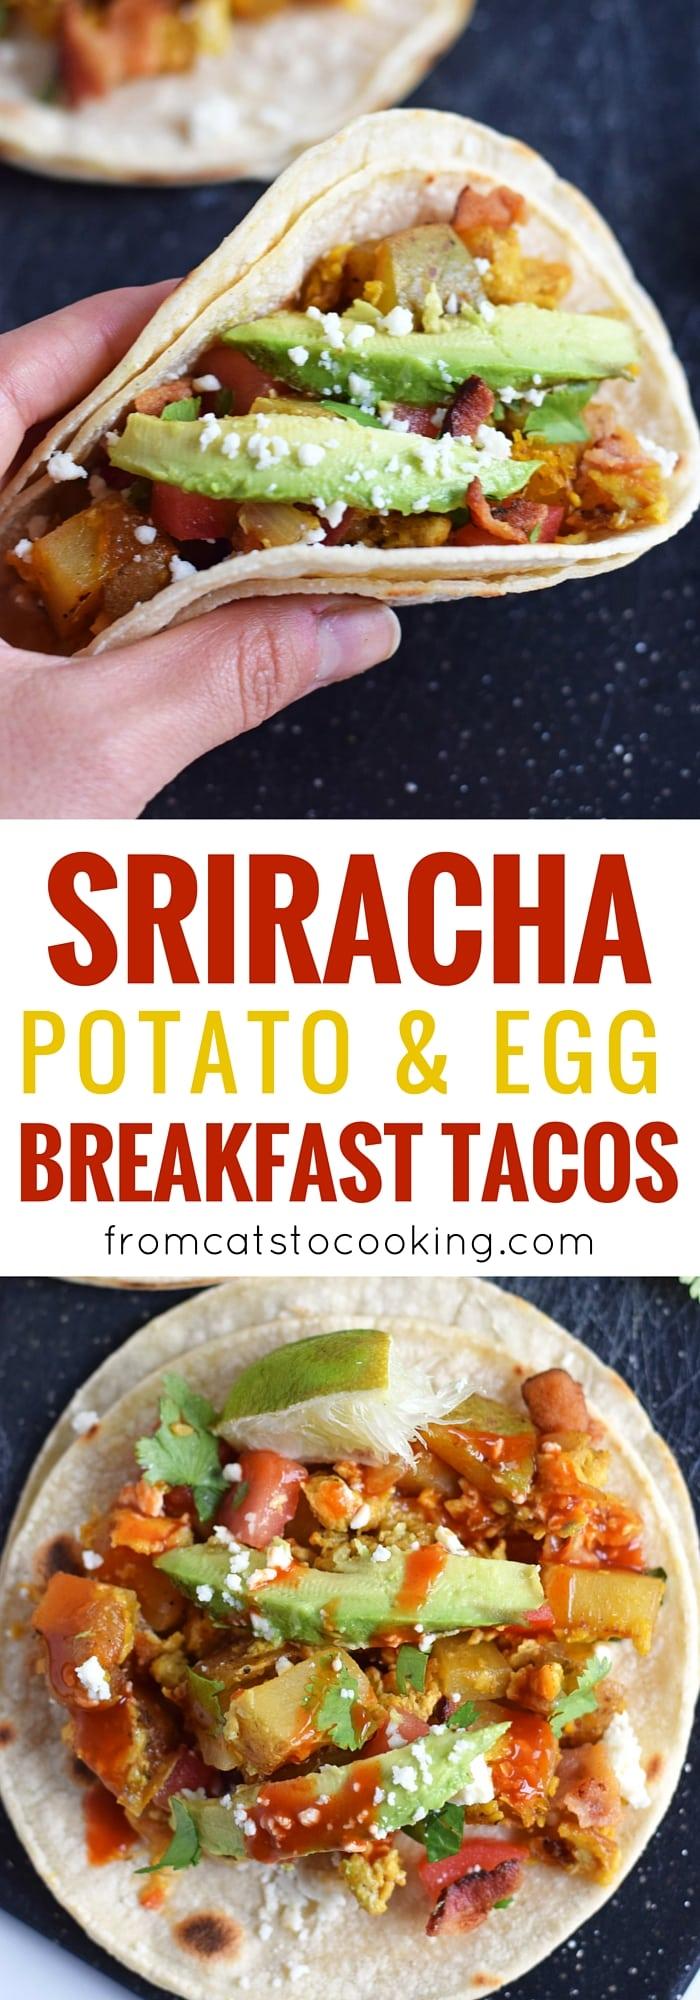 Sriracha Potato and Egg Breakfast Tacos - Isabel Eats